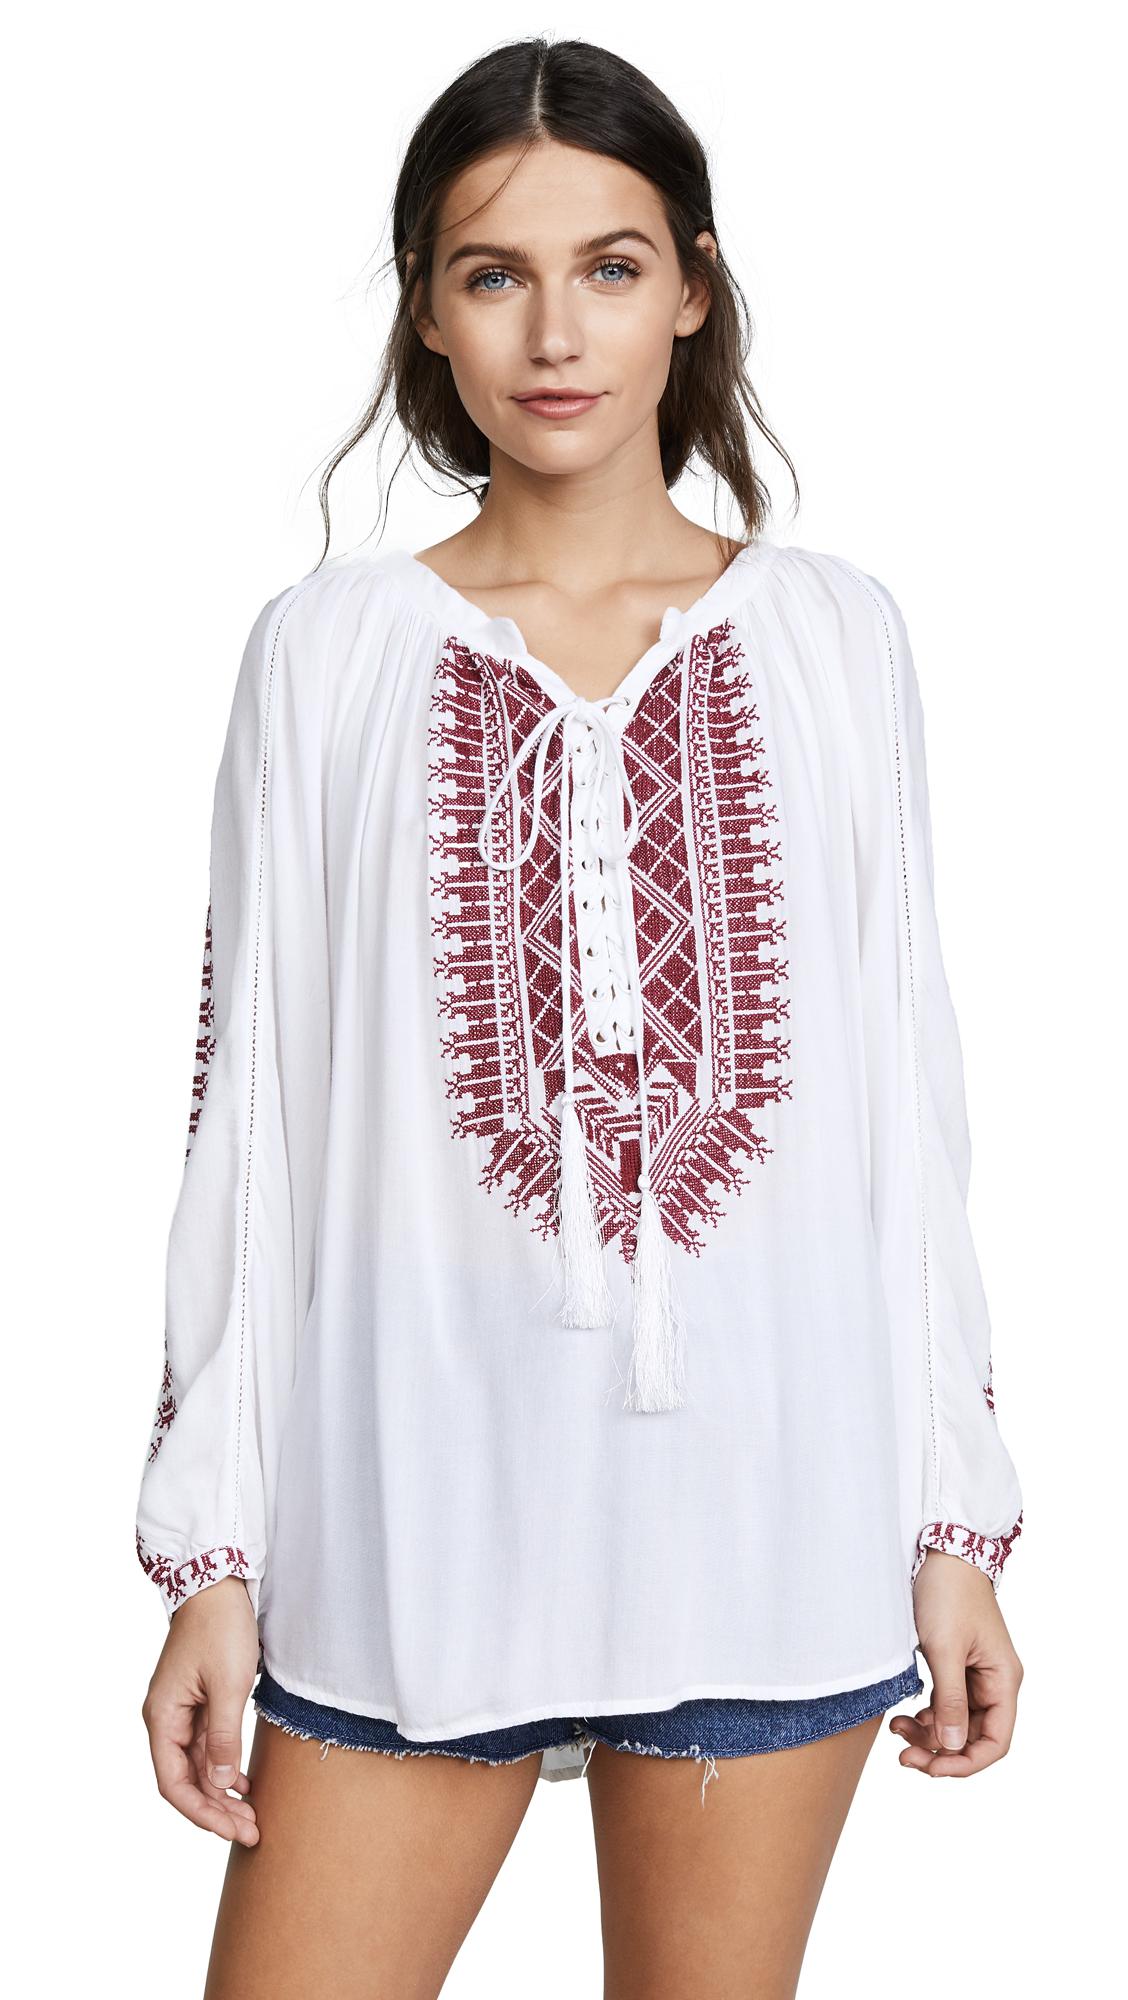 Melissa Odabash Simona Cover Up Top - White/Red